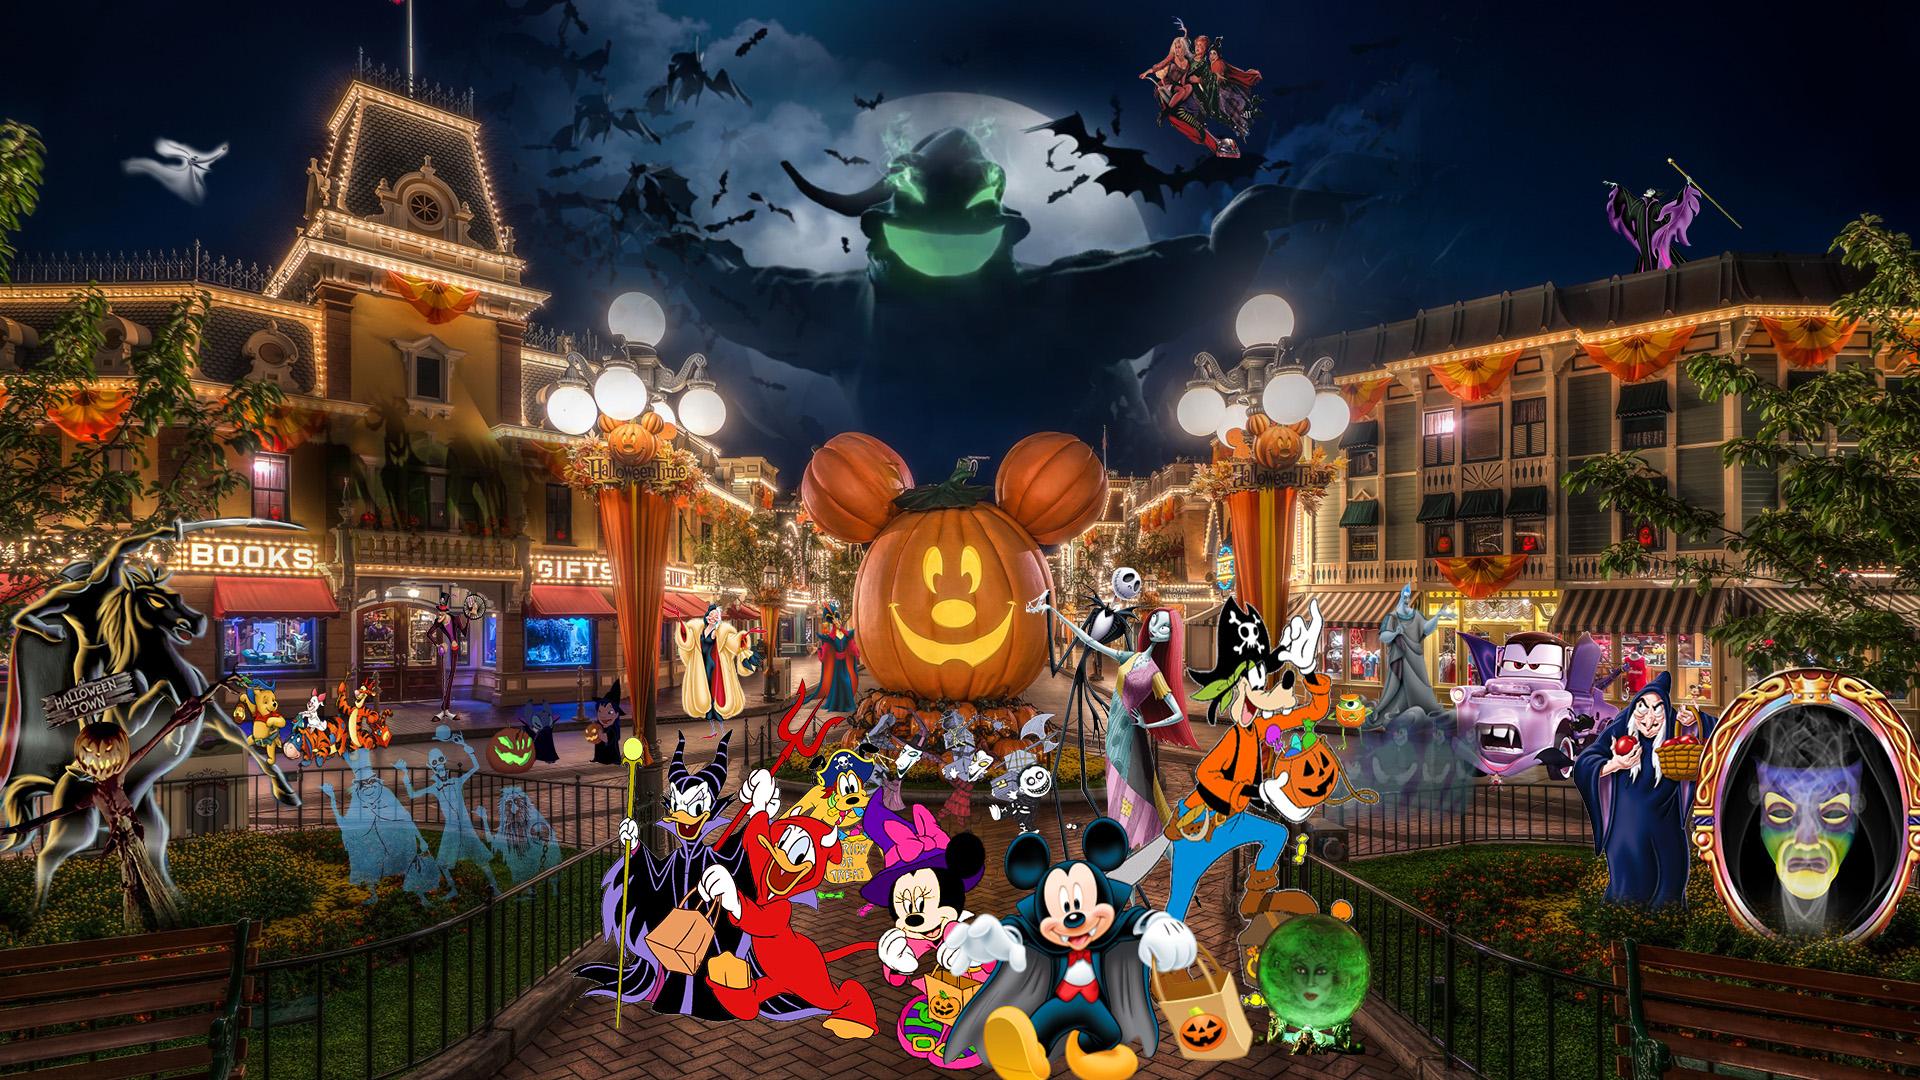 Disneyland: Halloween Wallpaper by The-Dark-Mamba-995 on ...